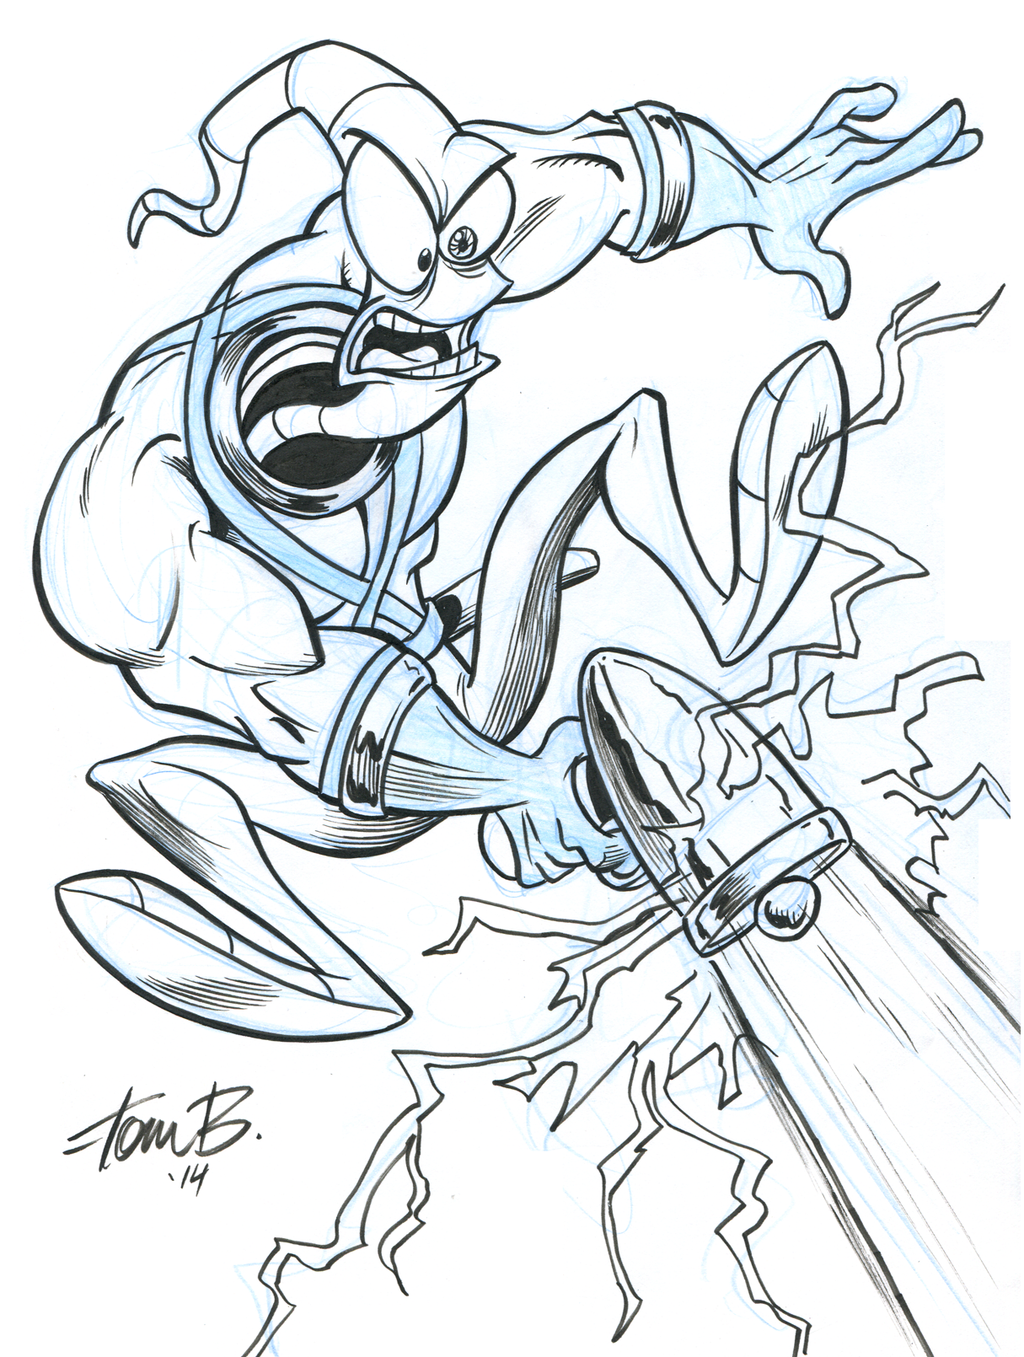 Earthworm Jim By Tombancroft On Deviantart Earthworm Jim Pop Art Drawing Animated Drawings